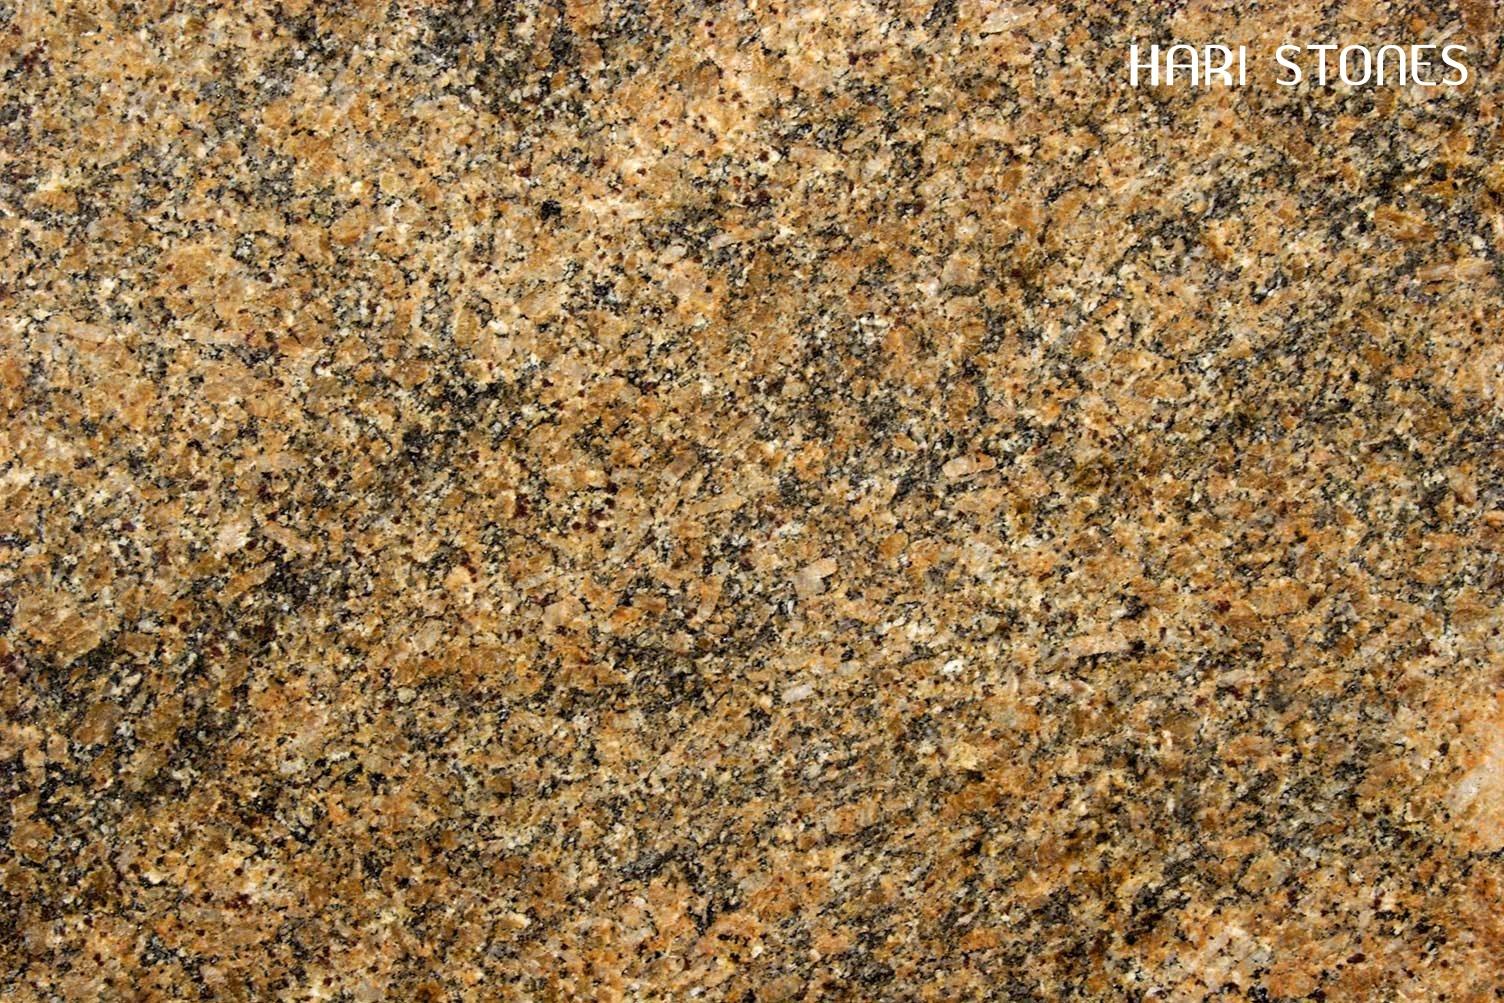 Key West Gold Granite Slabs Suppliers